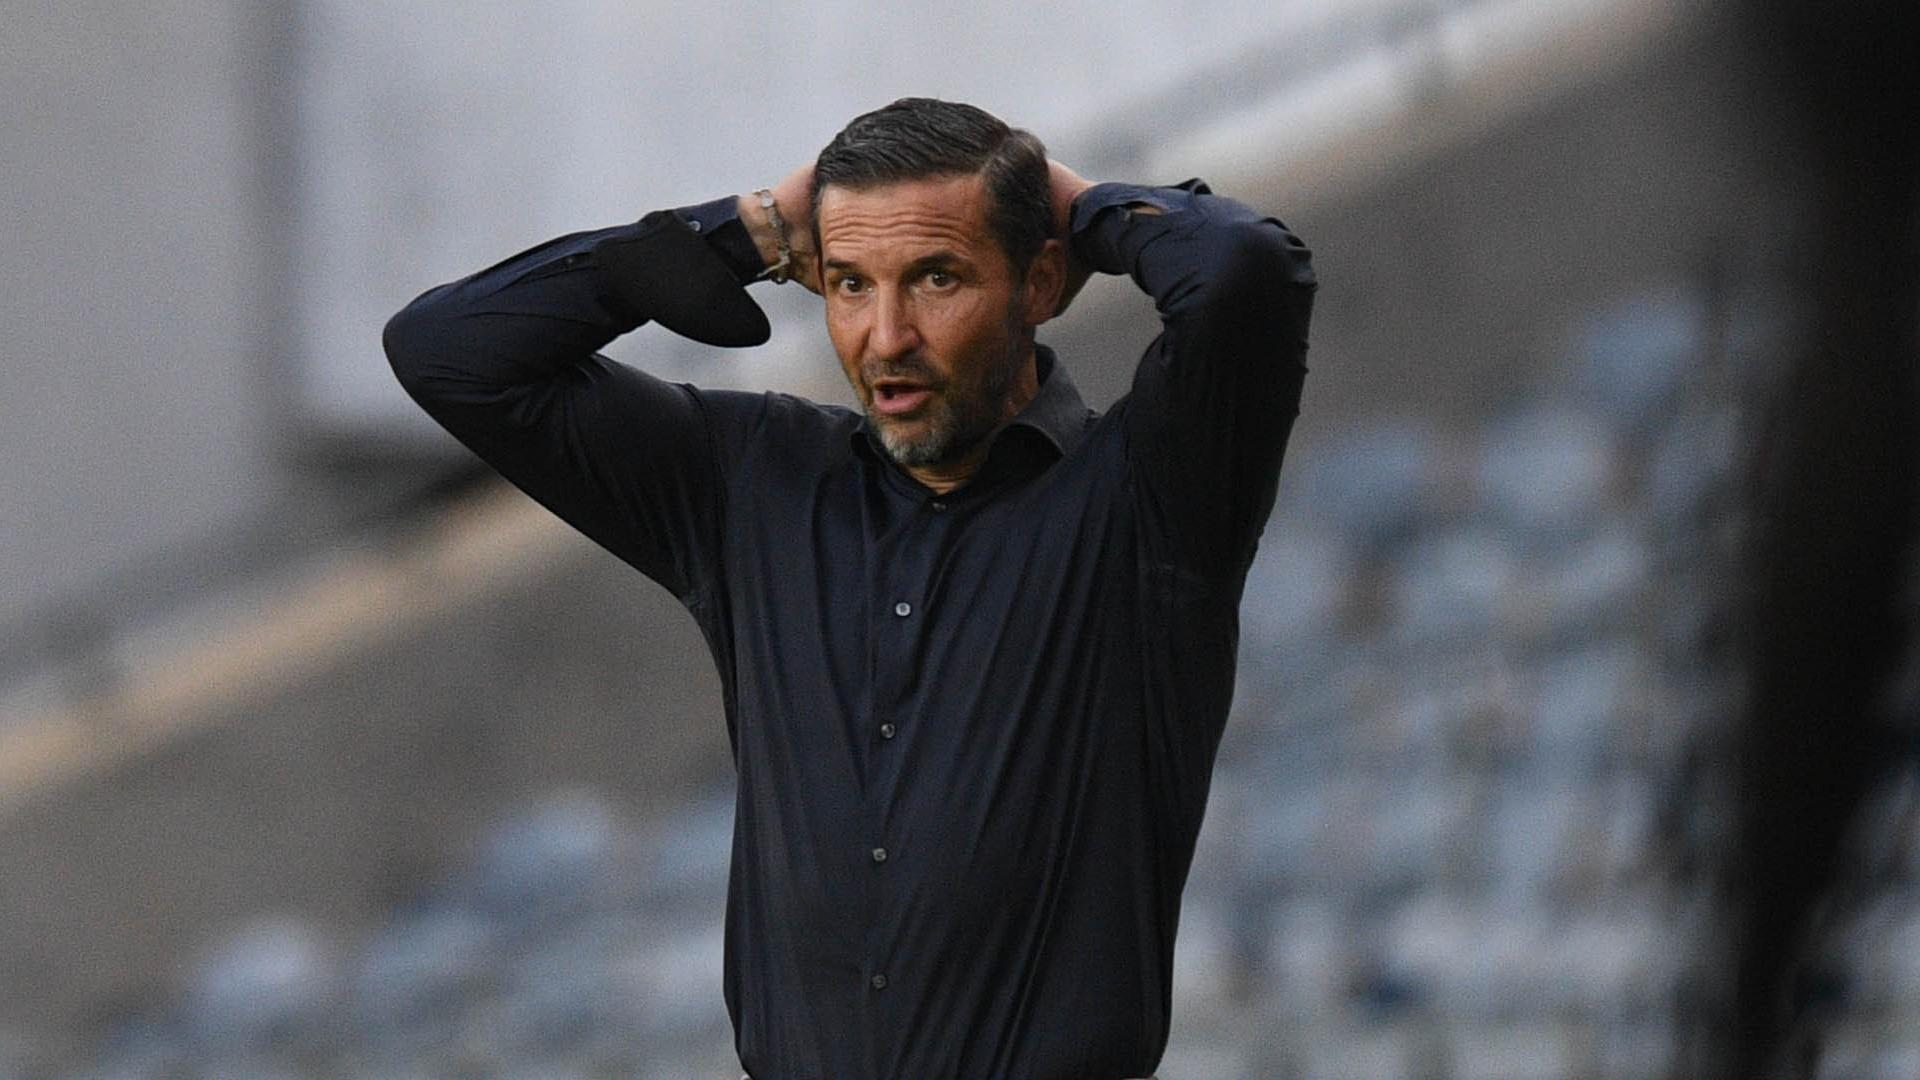 'Little disappointed' - Orlando Pirates' Zinnbauer unsatisfied despite Cape Town City win